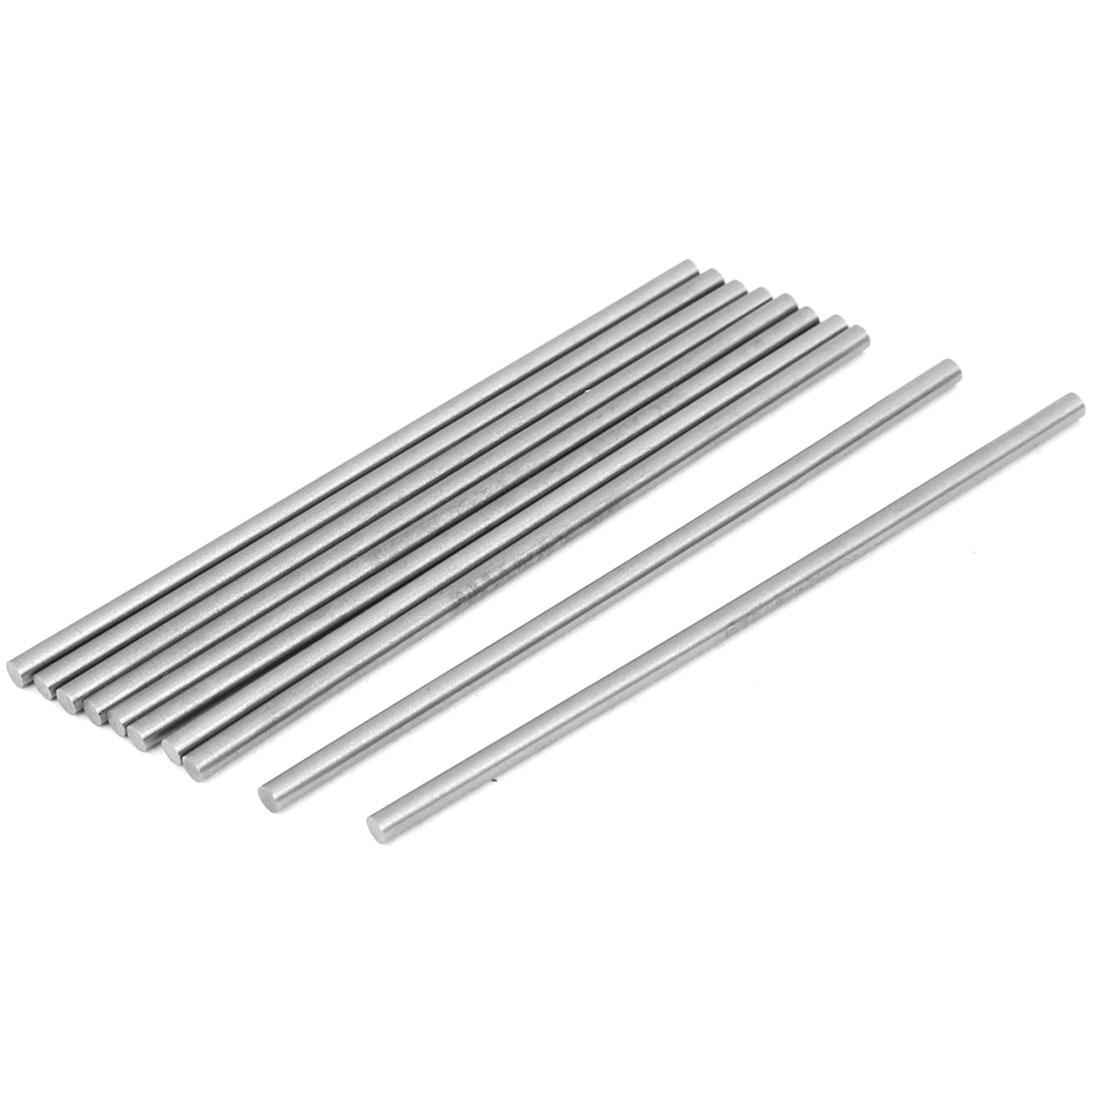 3.2mm x 100mm HSS Straight Machine Turning Tool Round Lathe Bar Rod Stick 10pcs